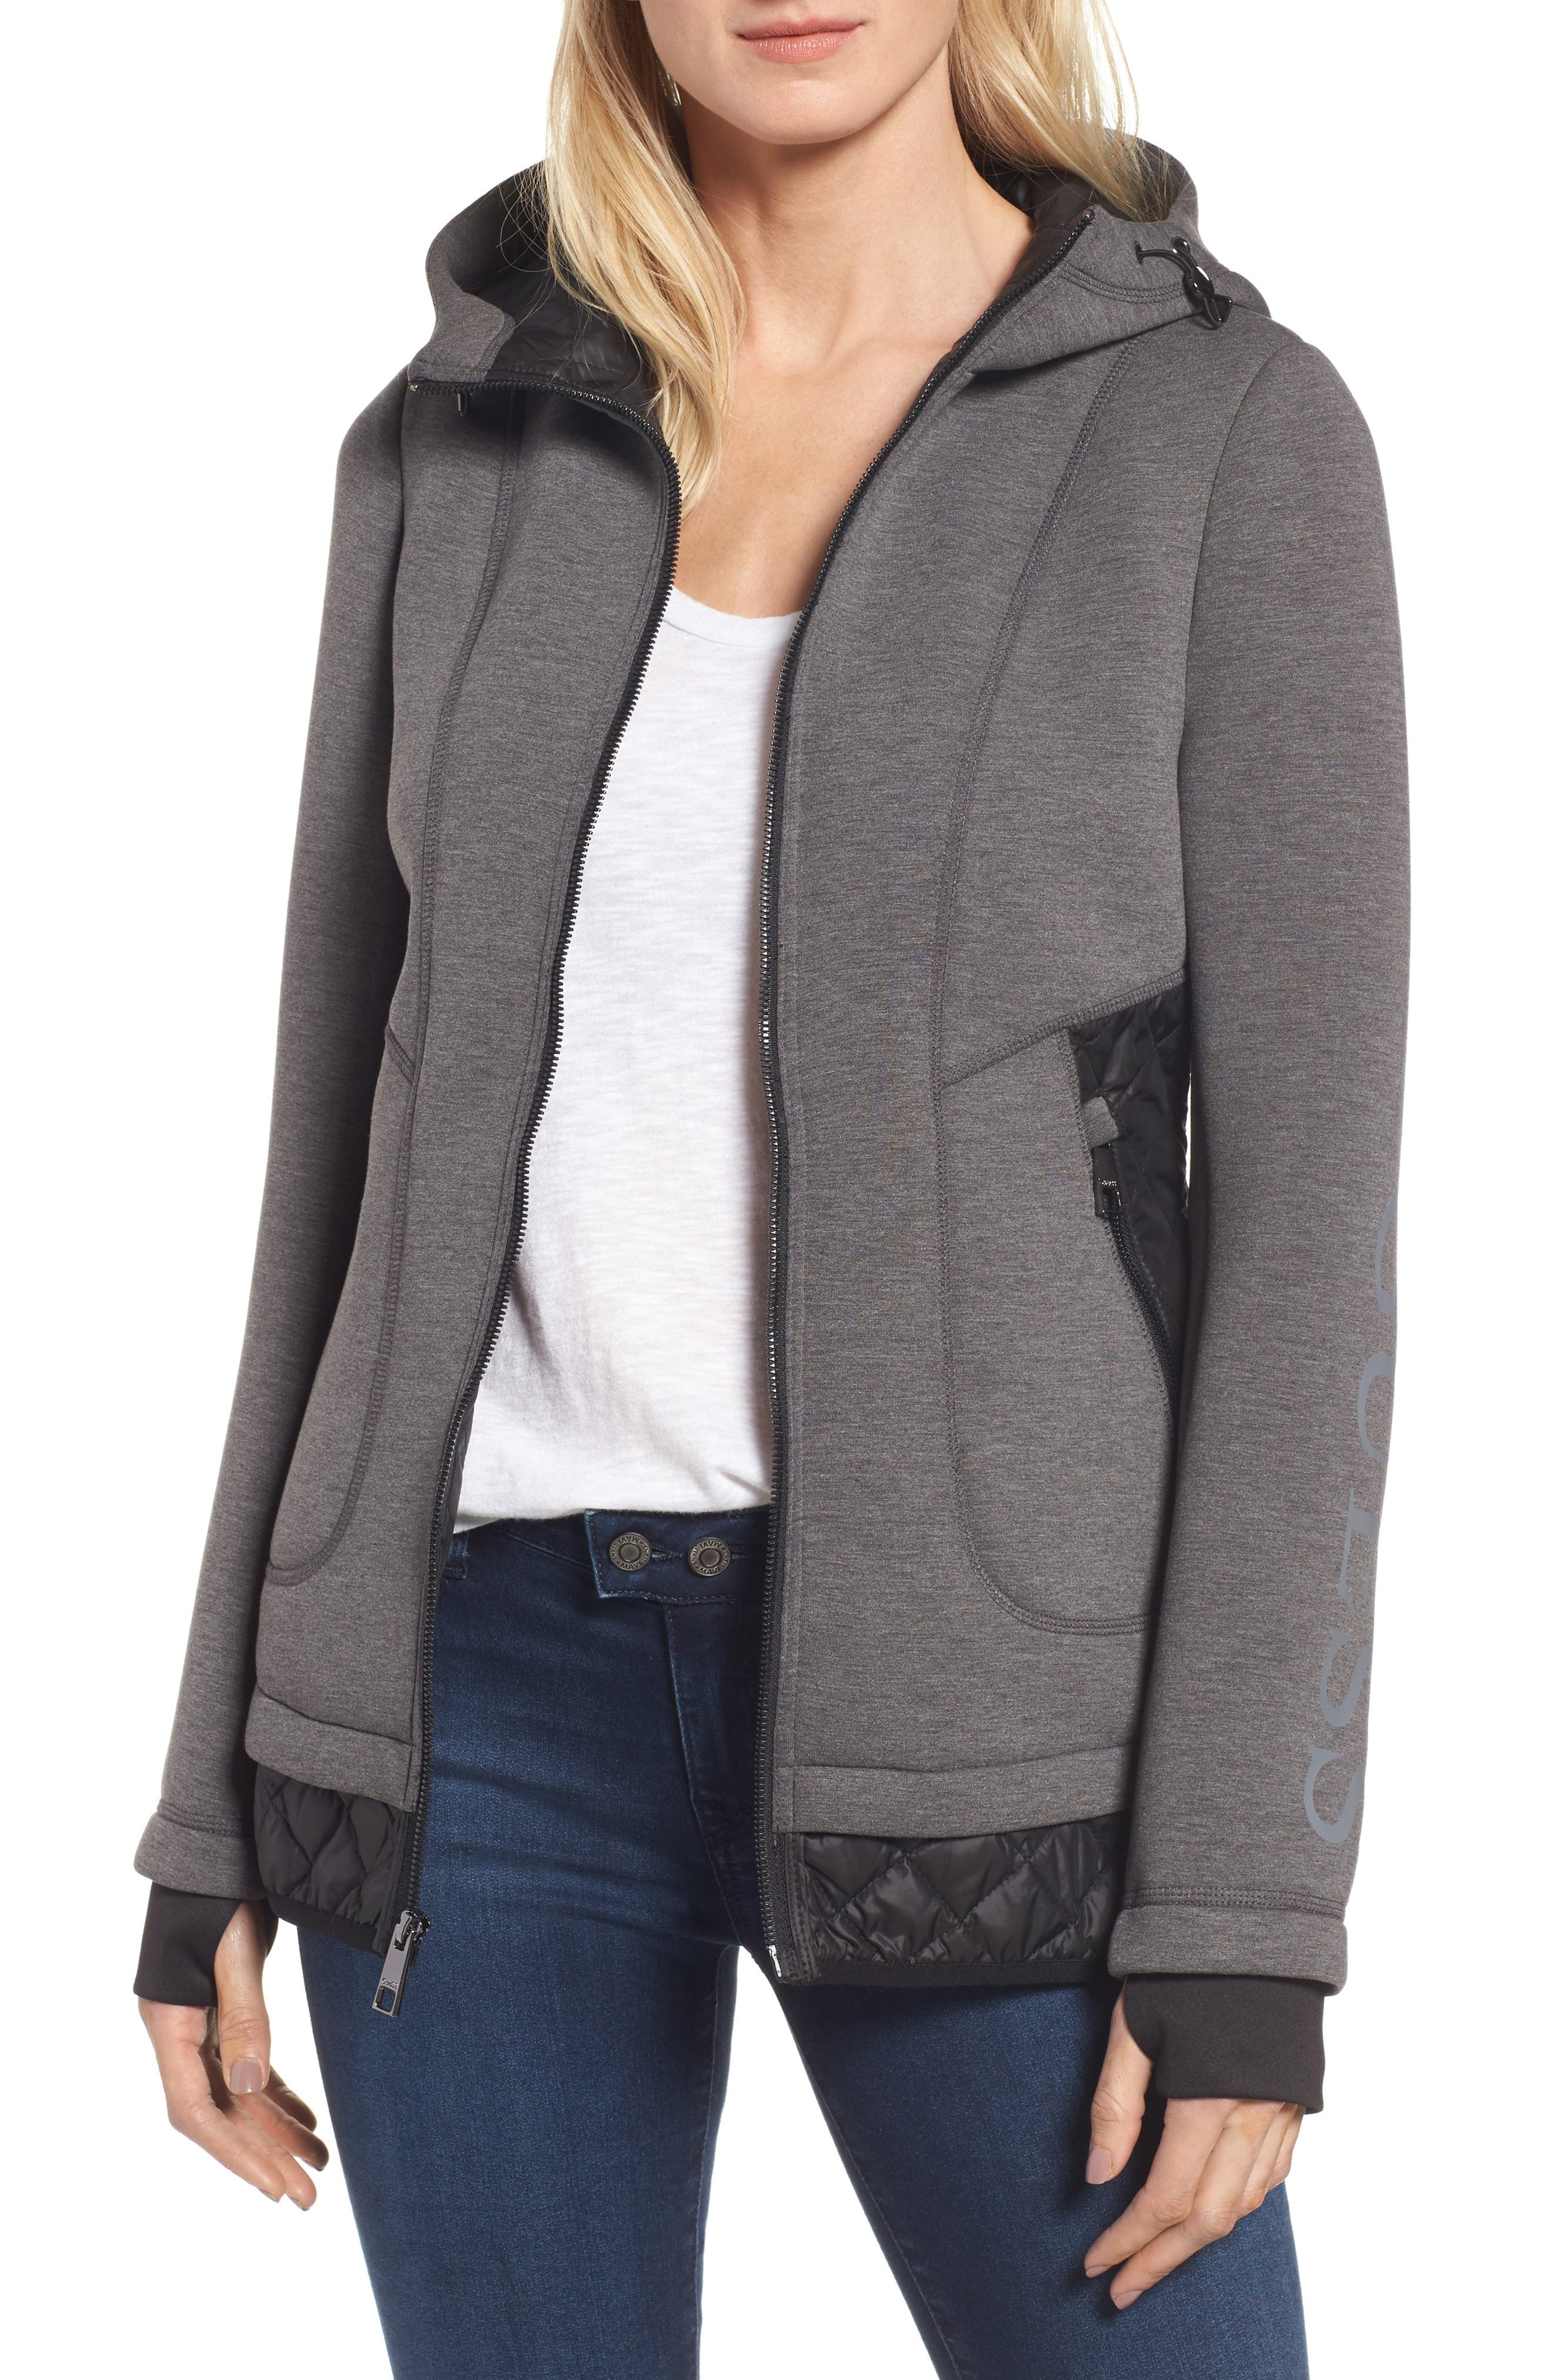 GUESS Mixed Media Hooded Jacket